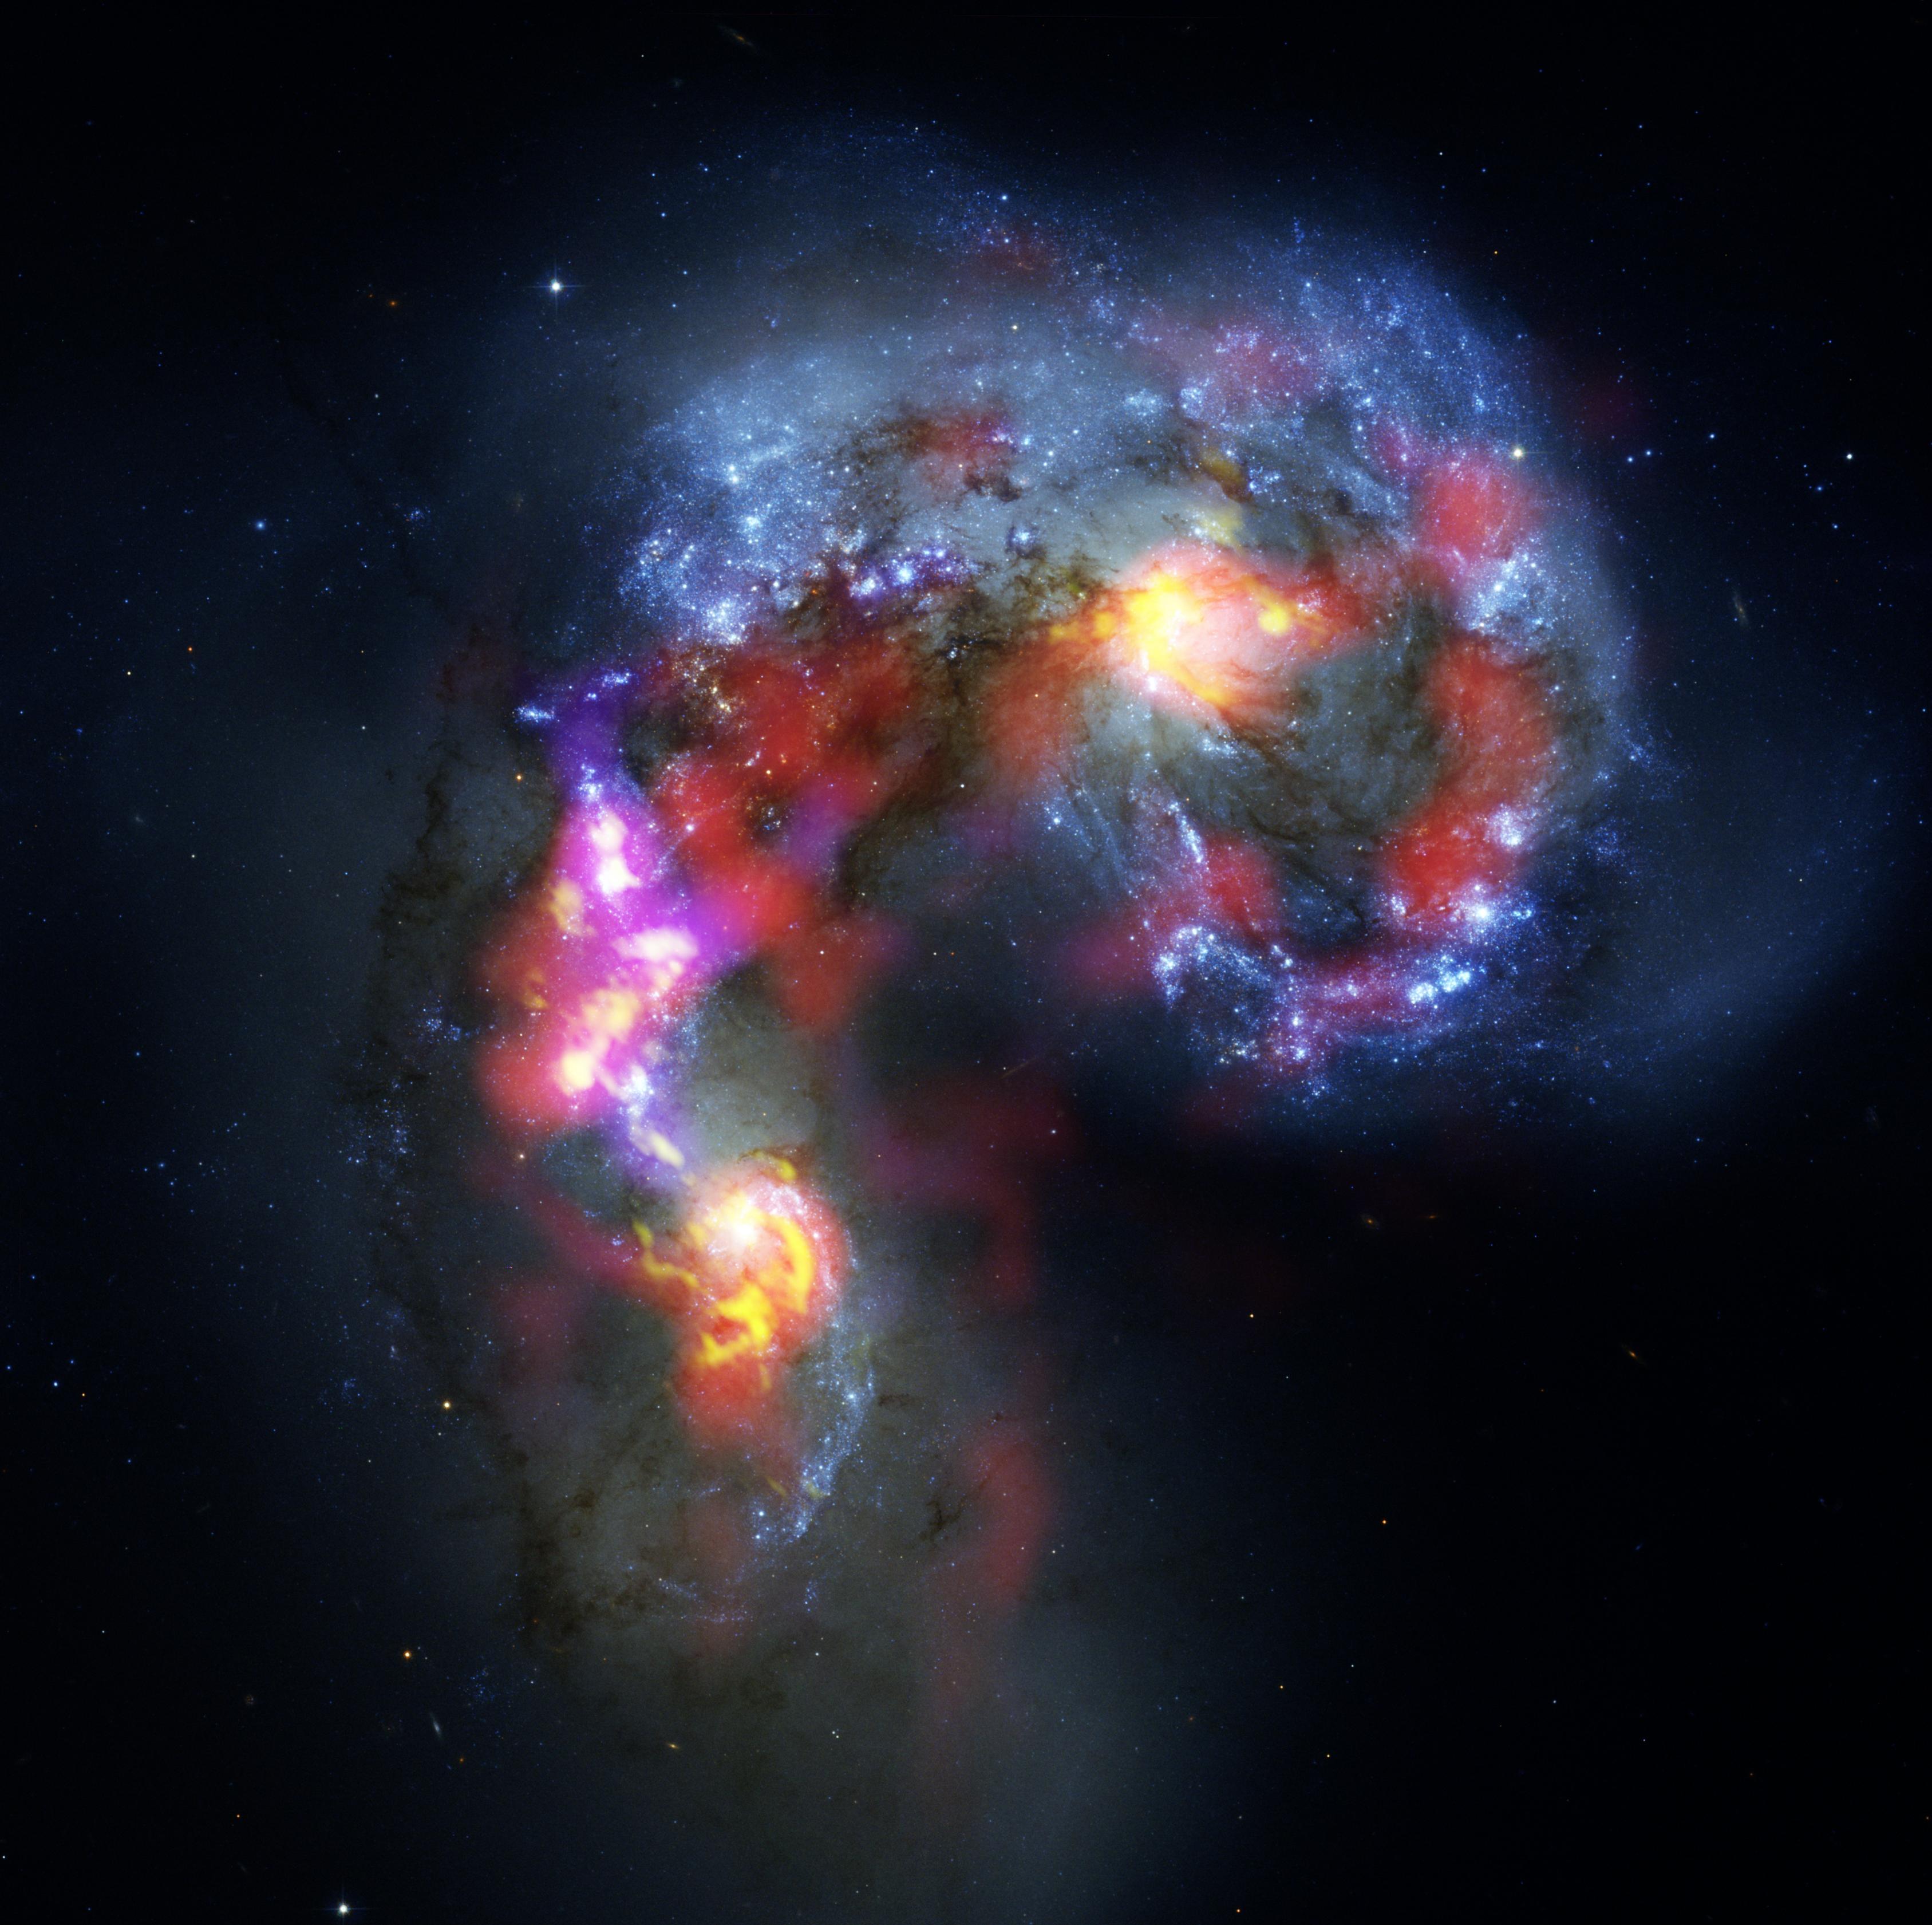 ALMA Image Antennae galaxies collide